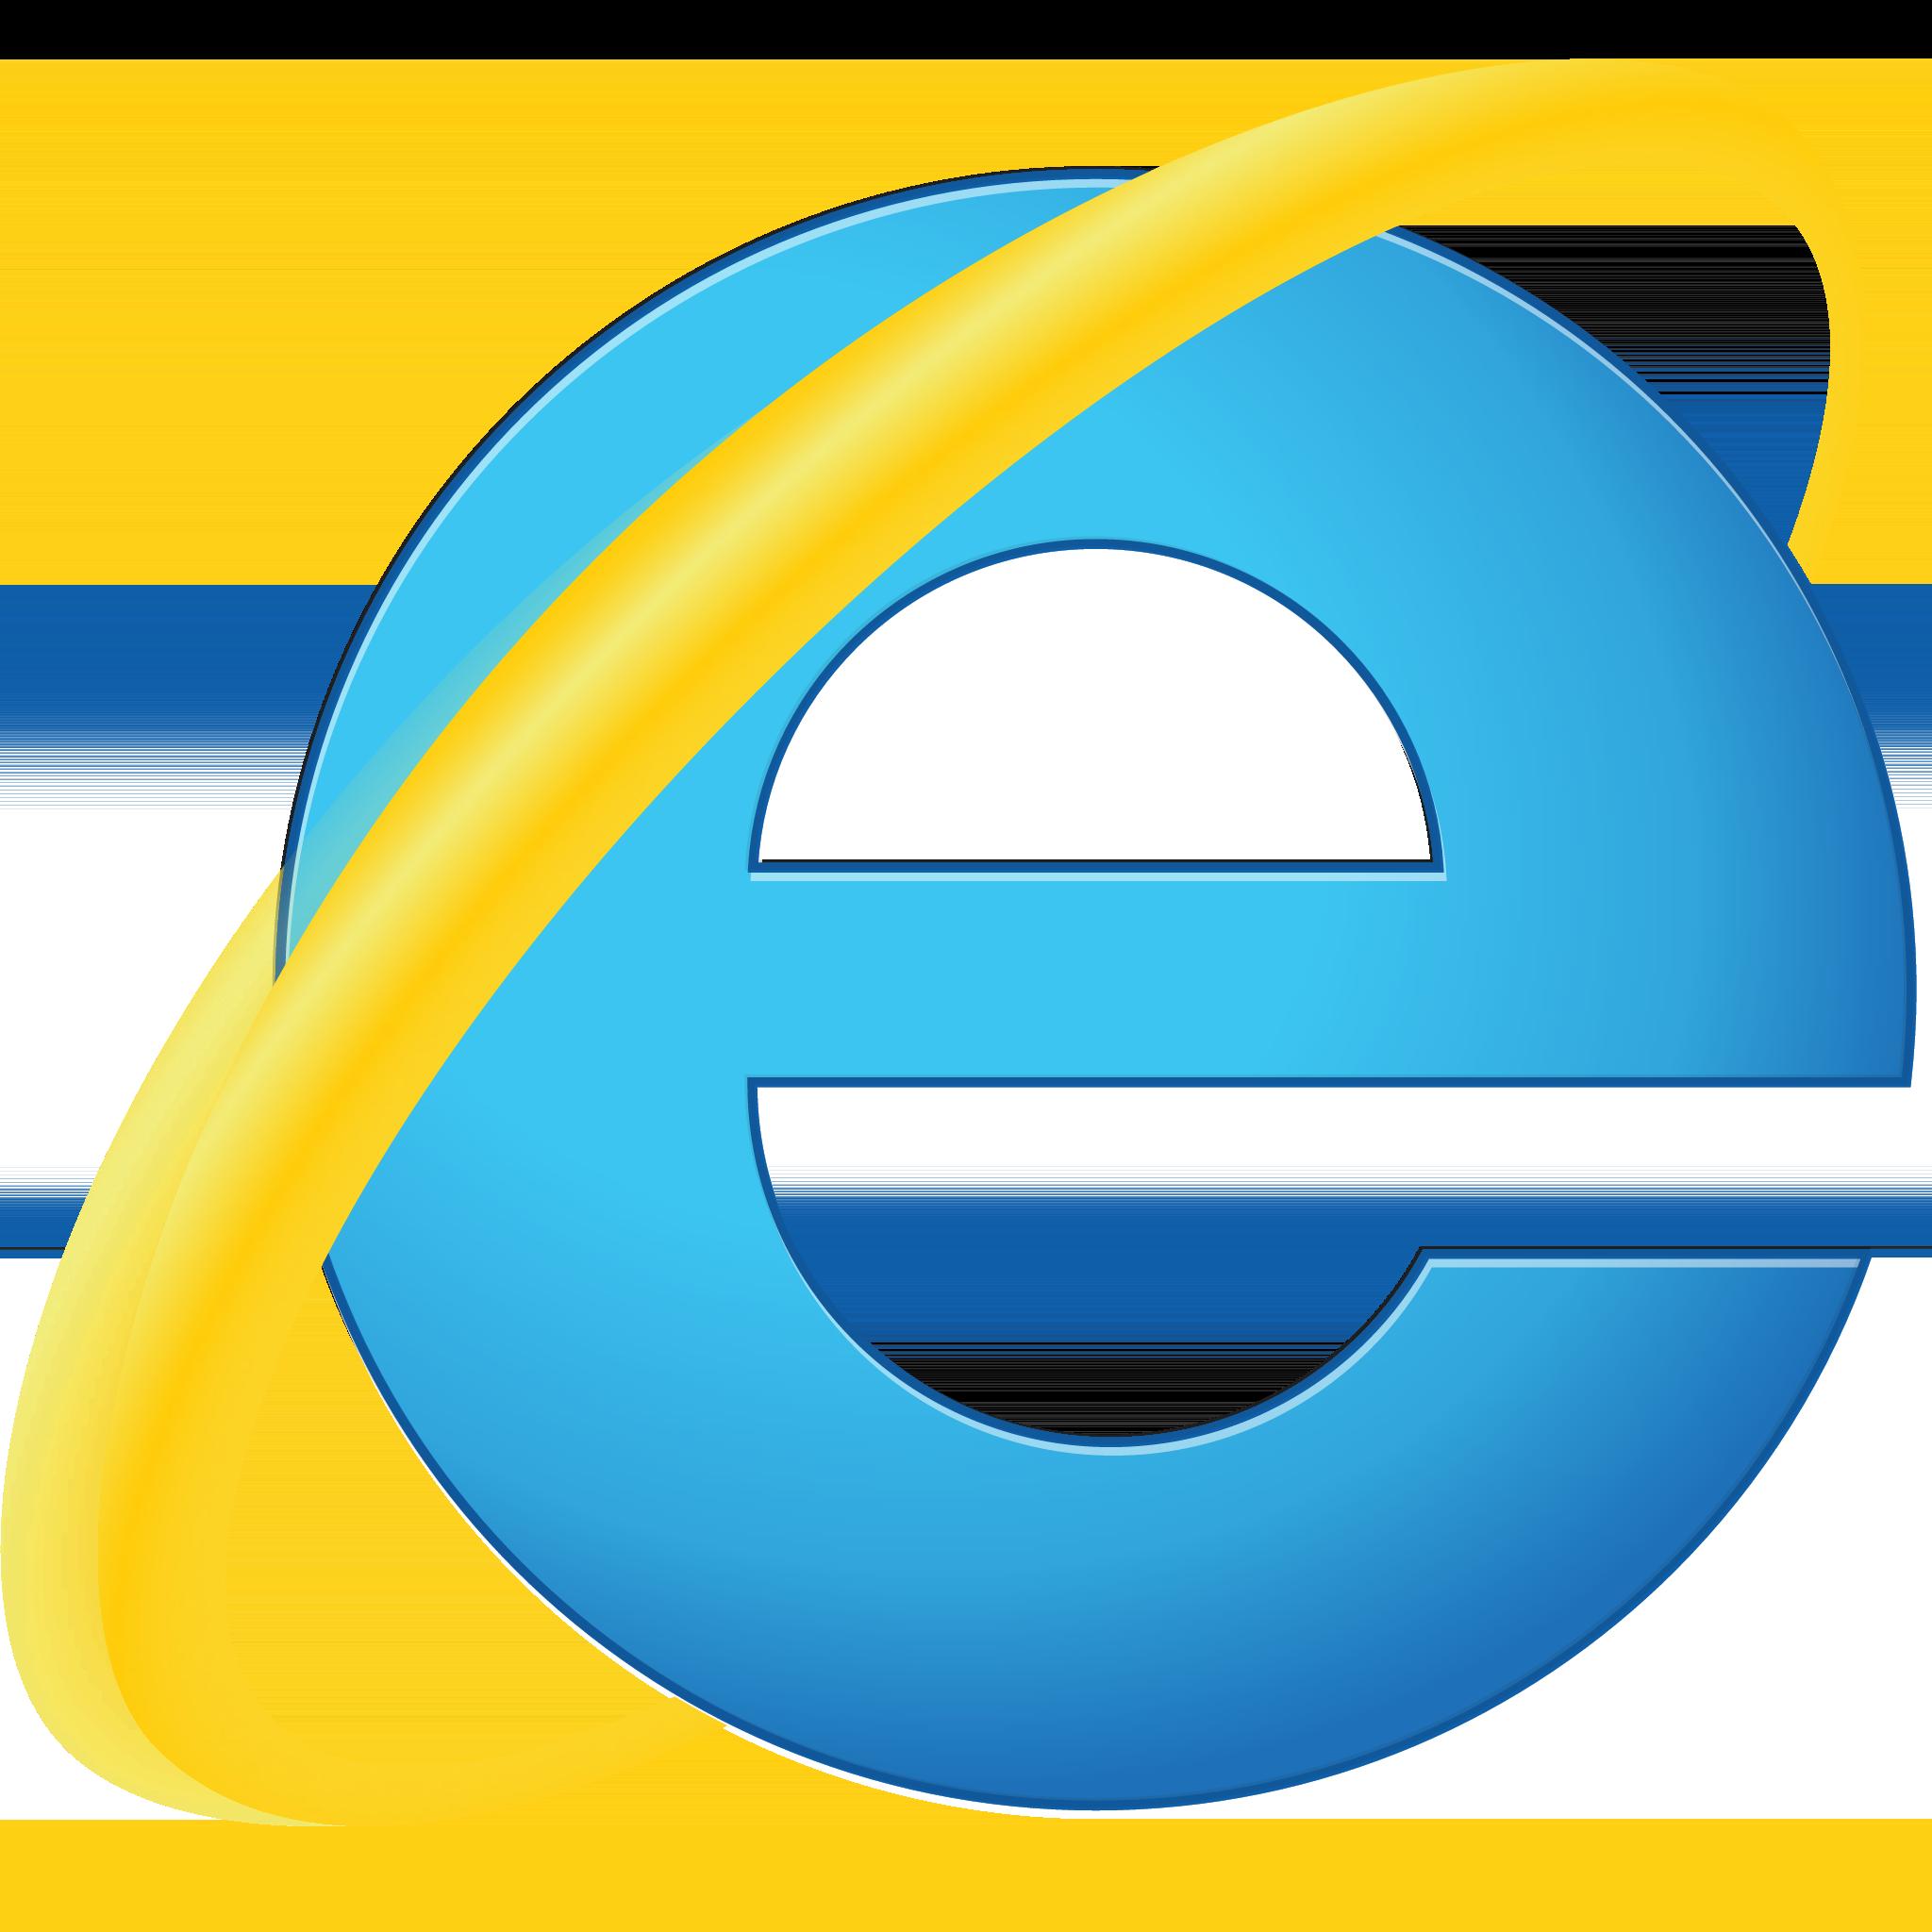 Explorer clipart background. Logos